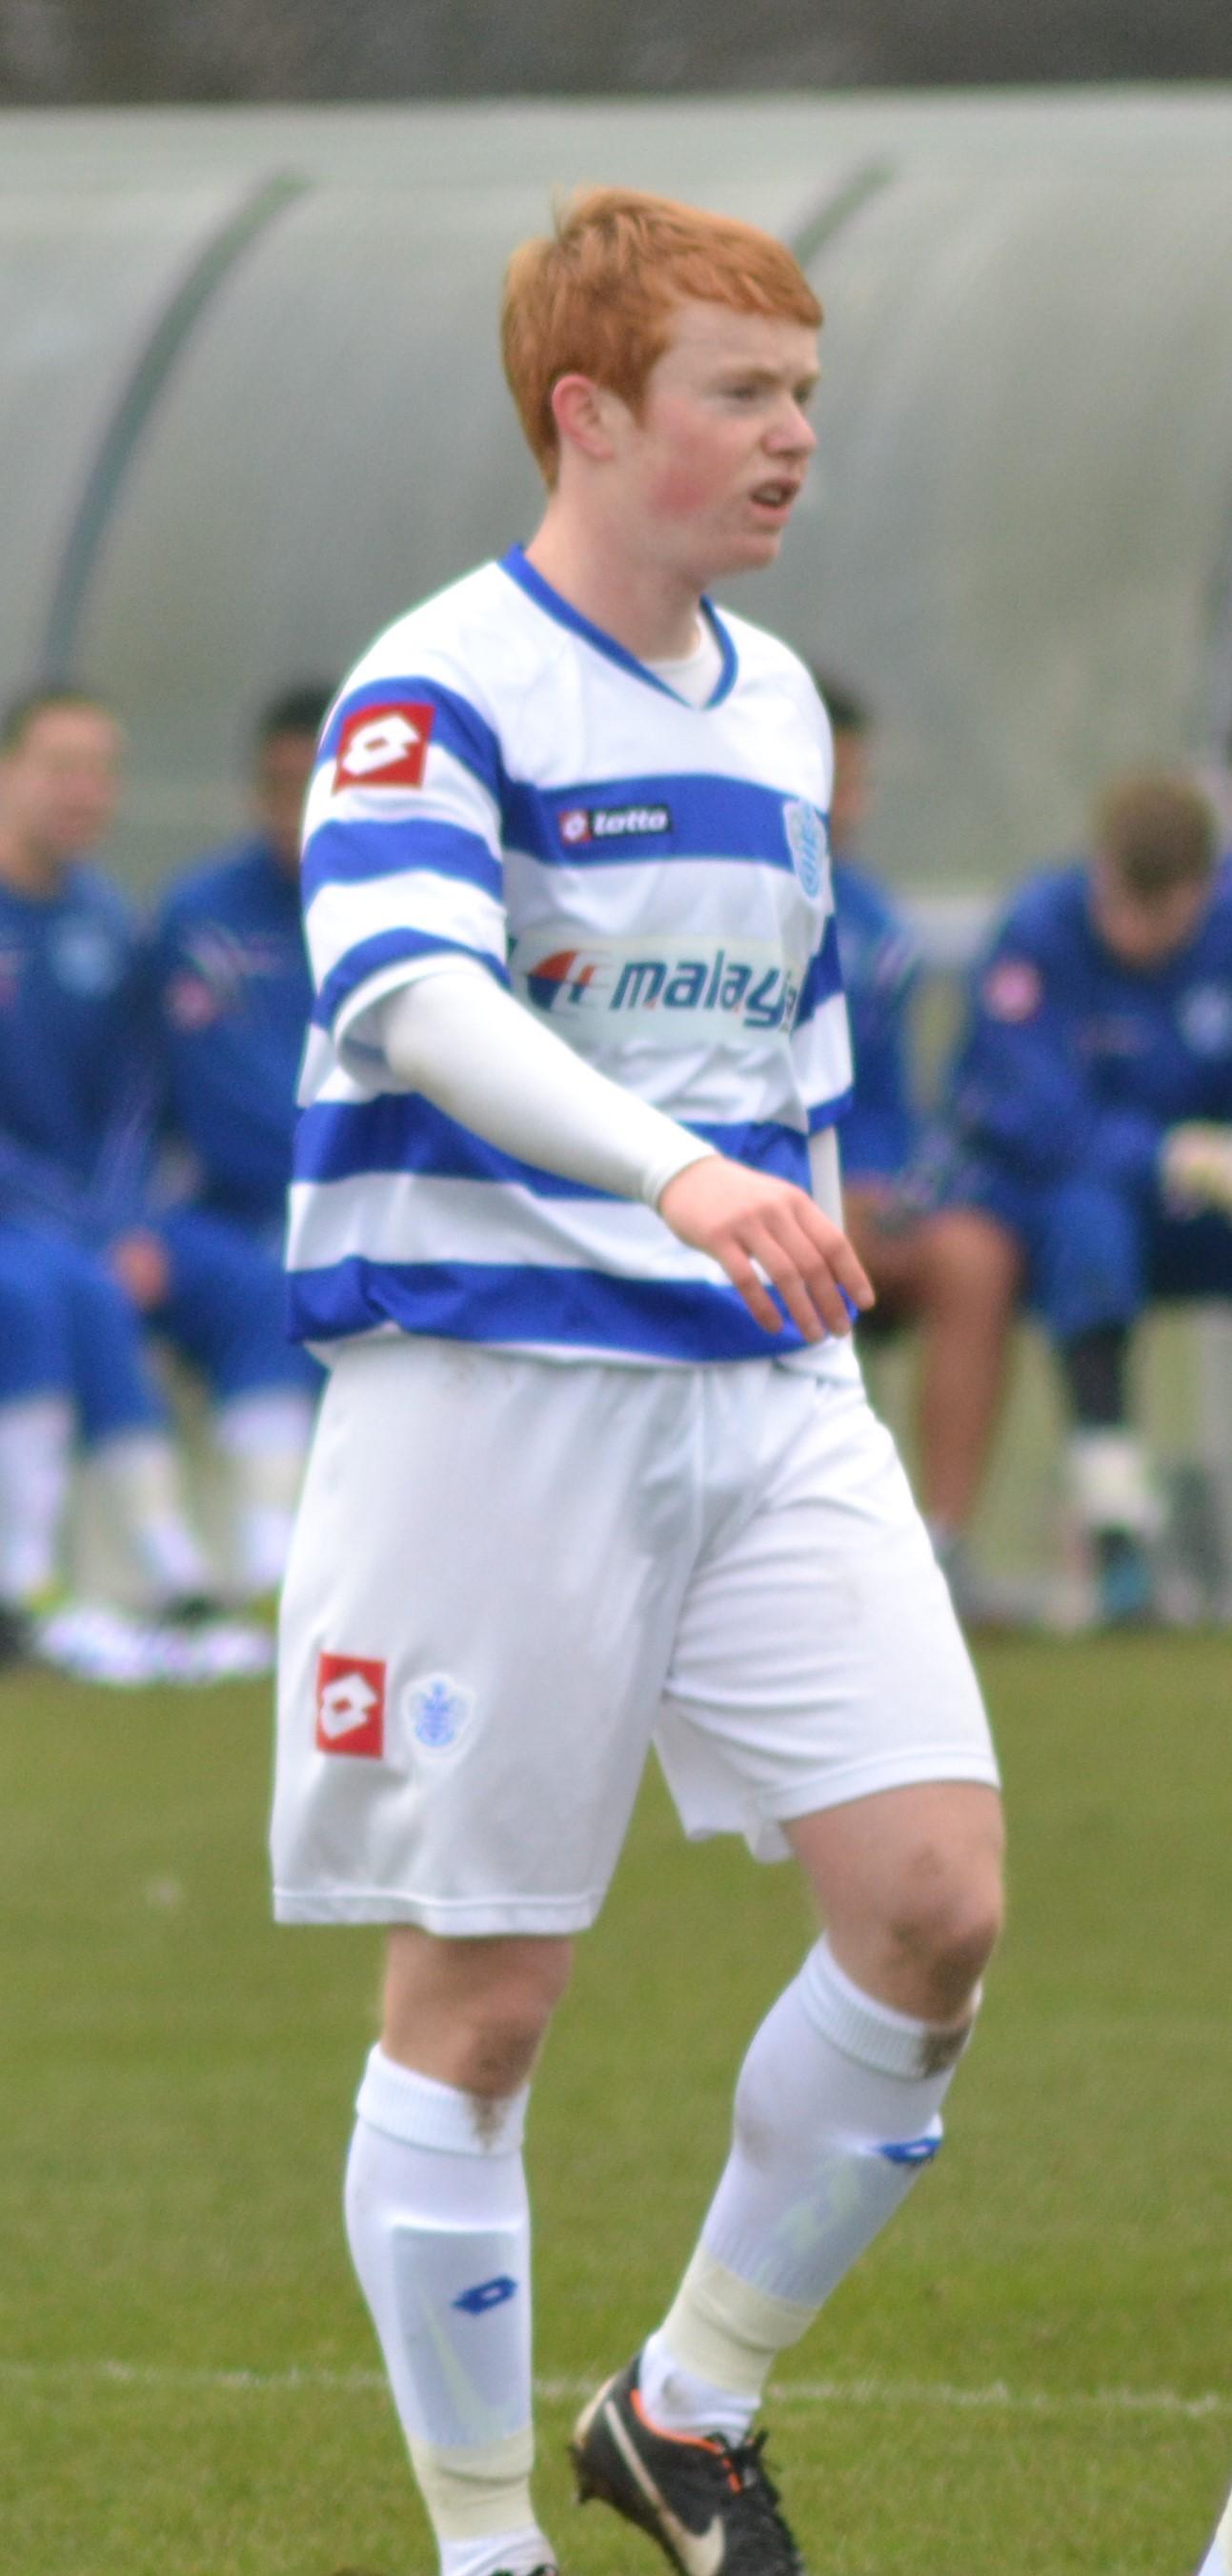 Jordan Walker playing football for QPR